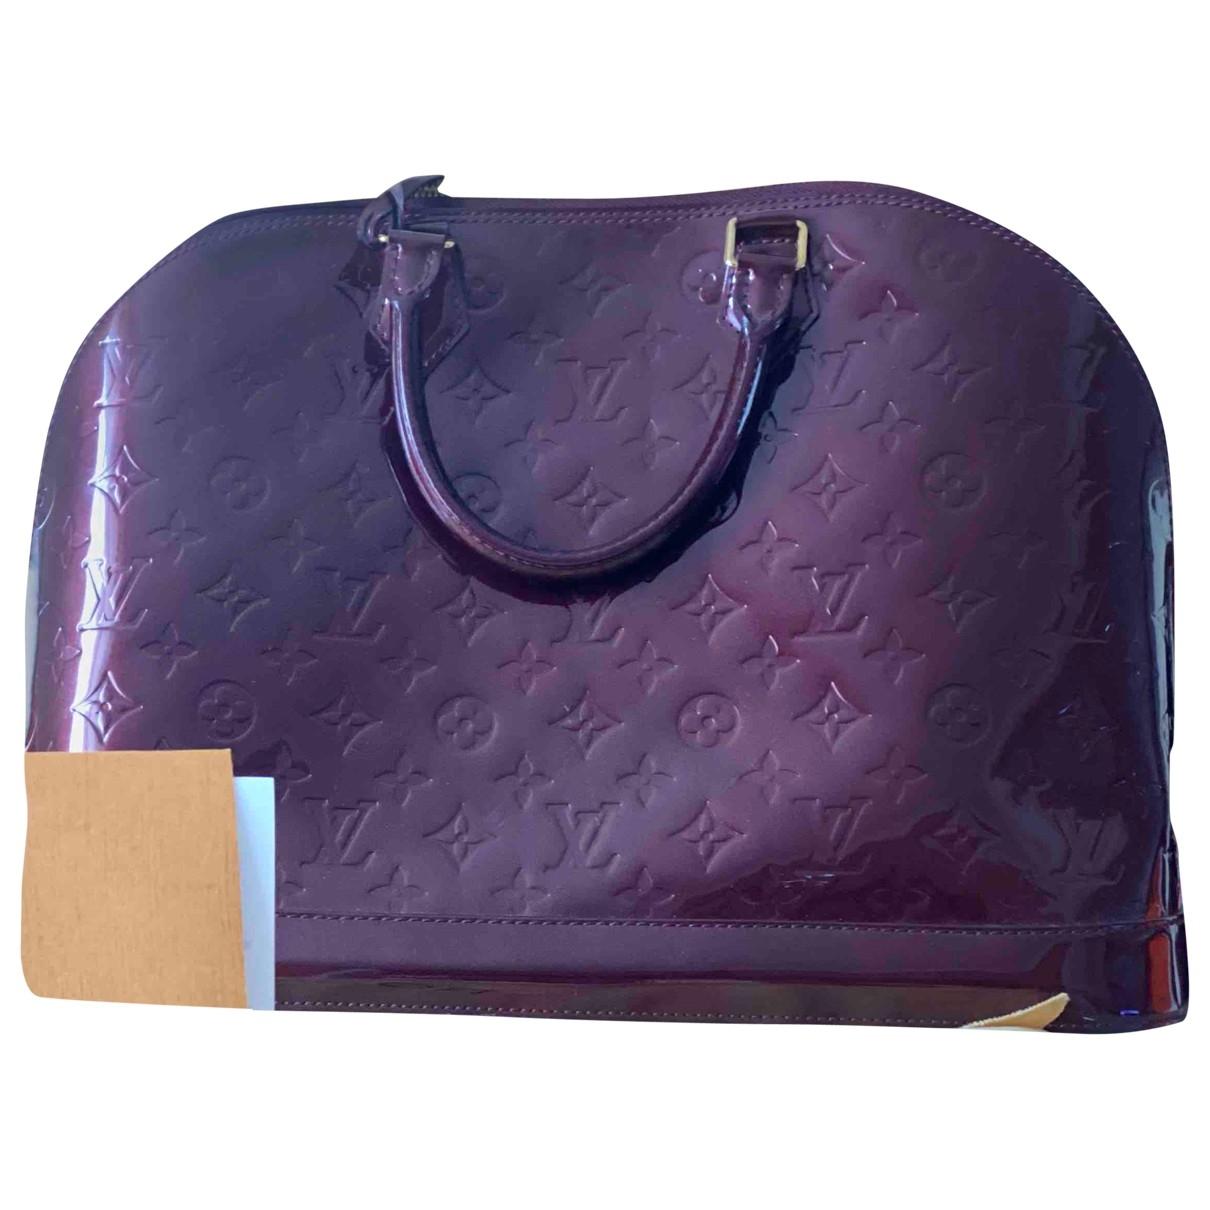 Louis Vuitton Alma Red Patent leather handbag for Women \N